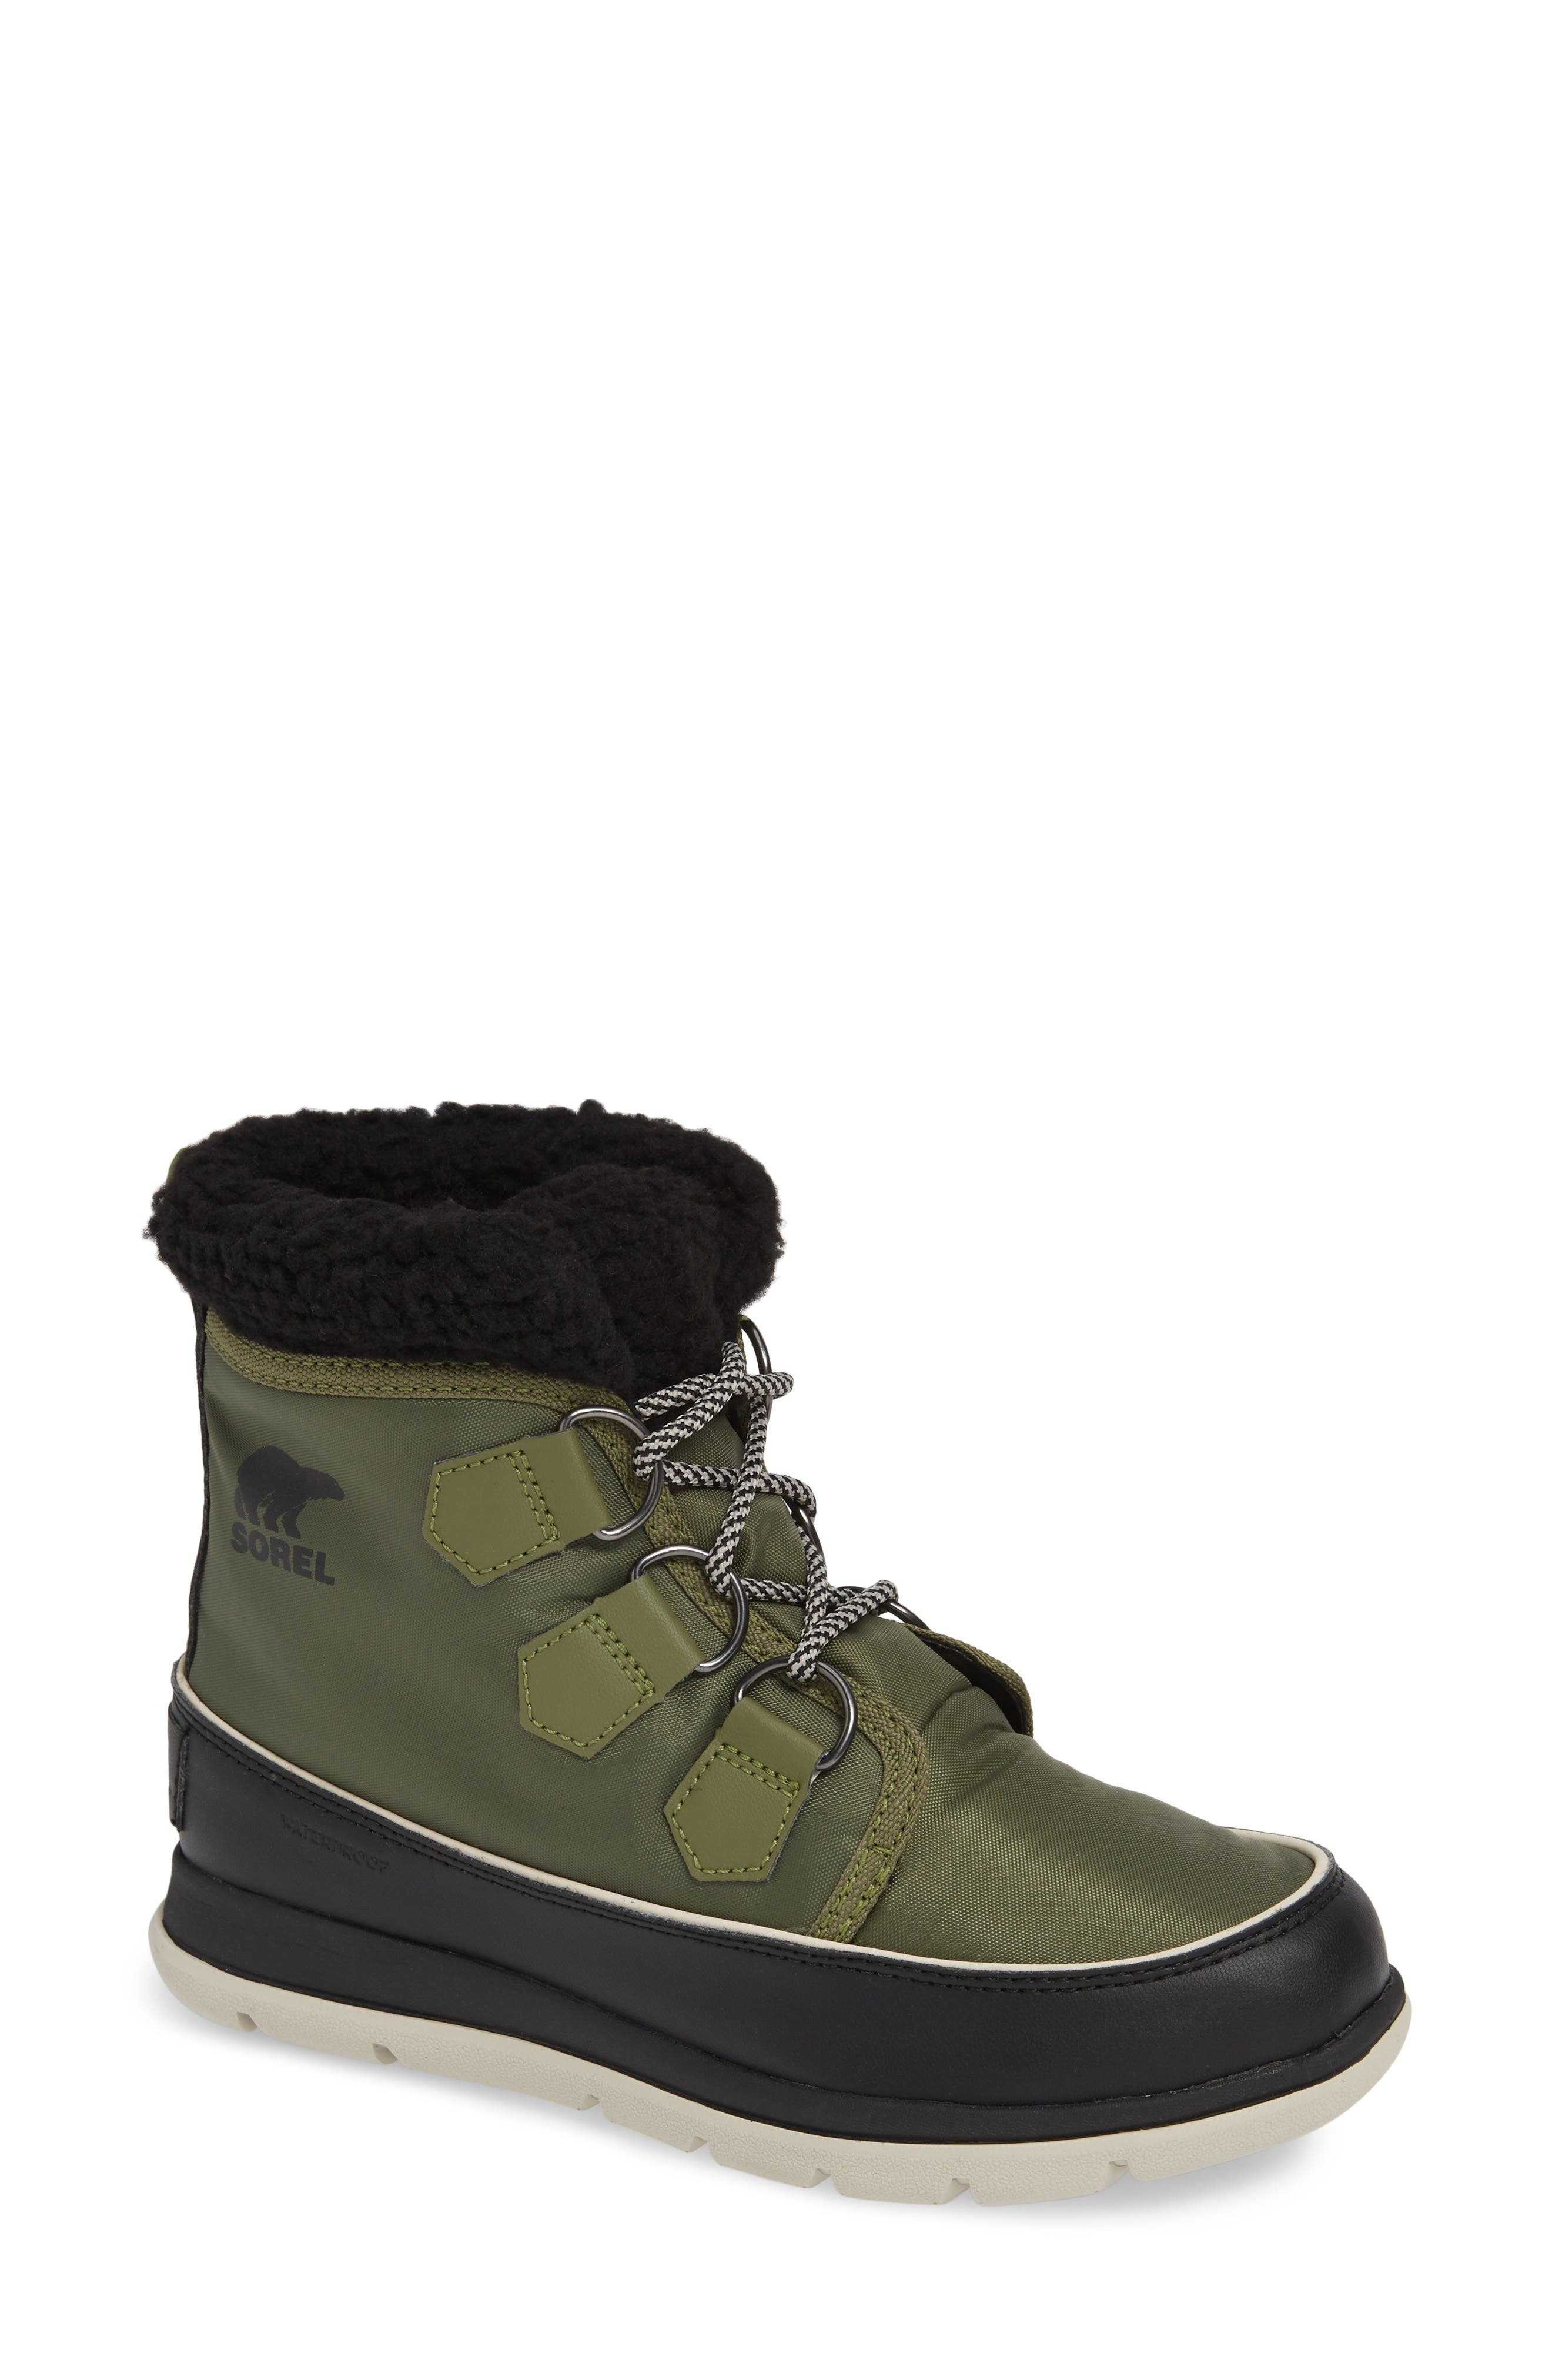 Explorer Carnival Waterproof Boot with Faux Fur Collar,                             Main thumbnail 1, color,                             371